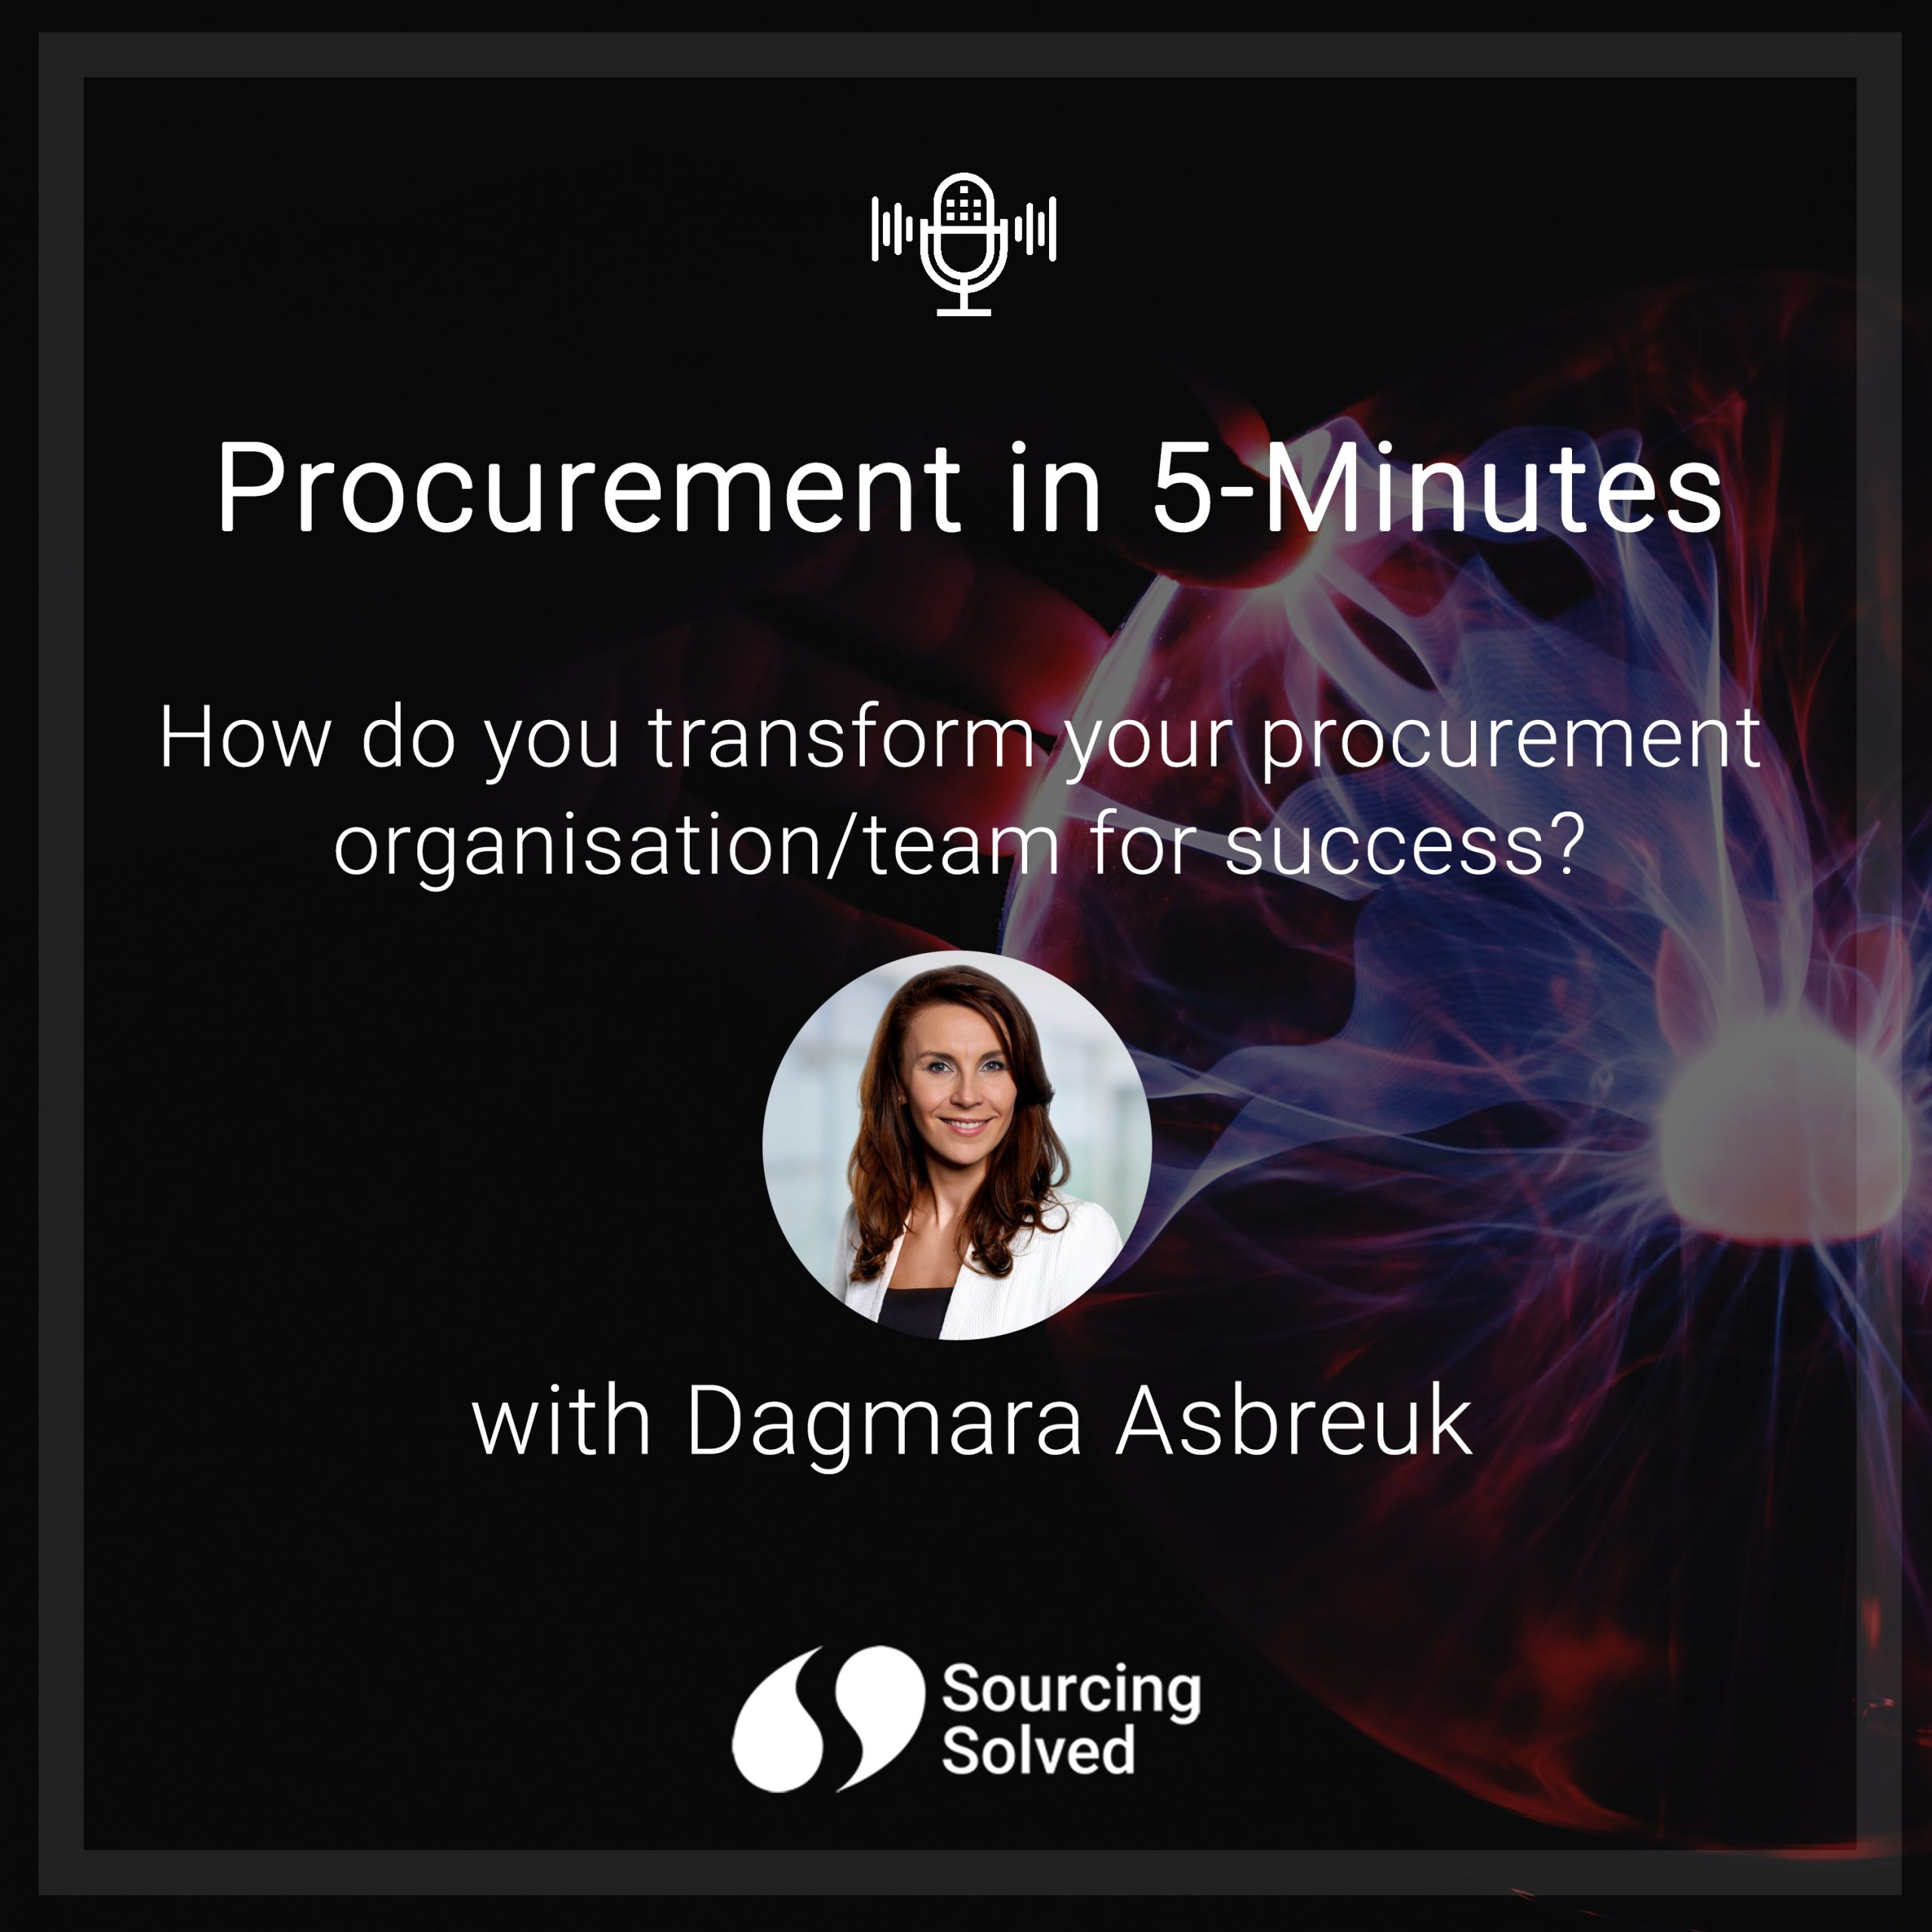 Procurement in 5-Minutes: How do you transform your procurement organisation/team for success?